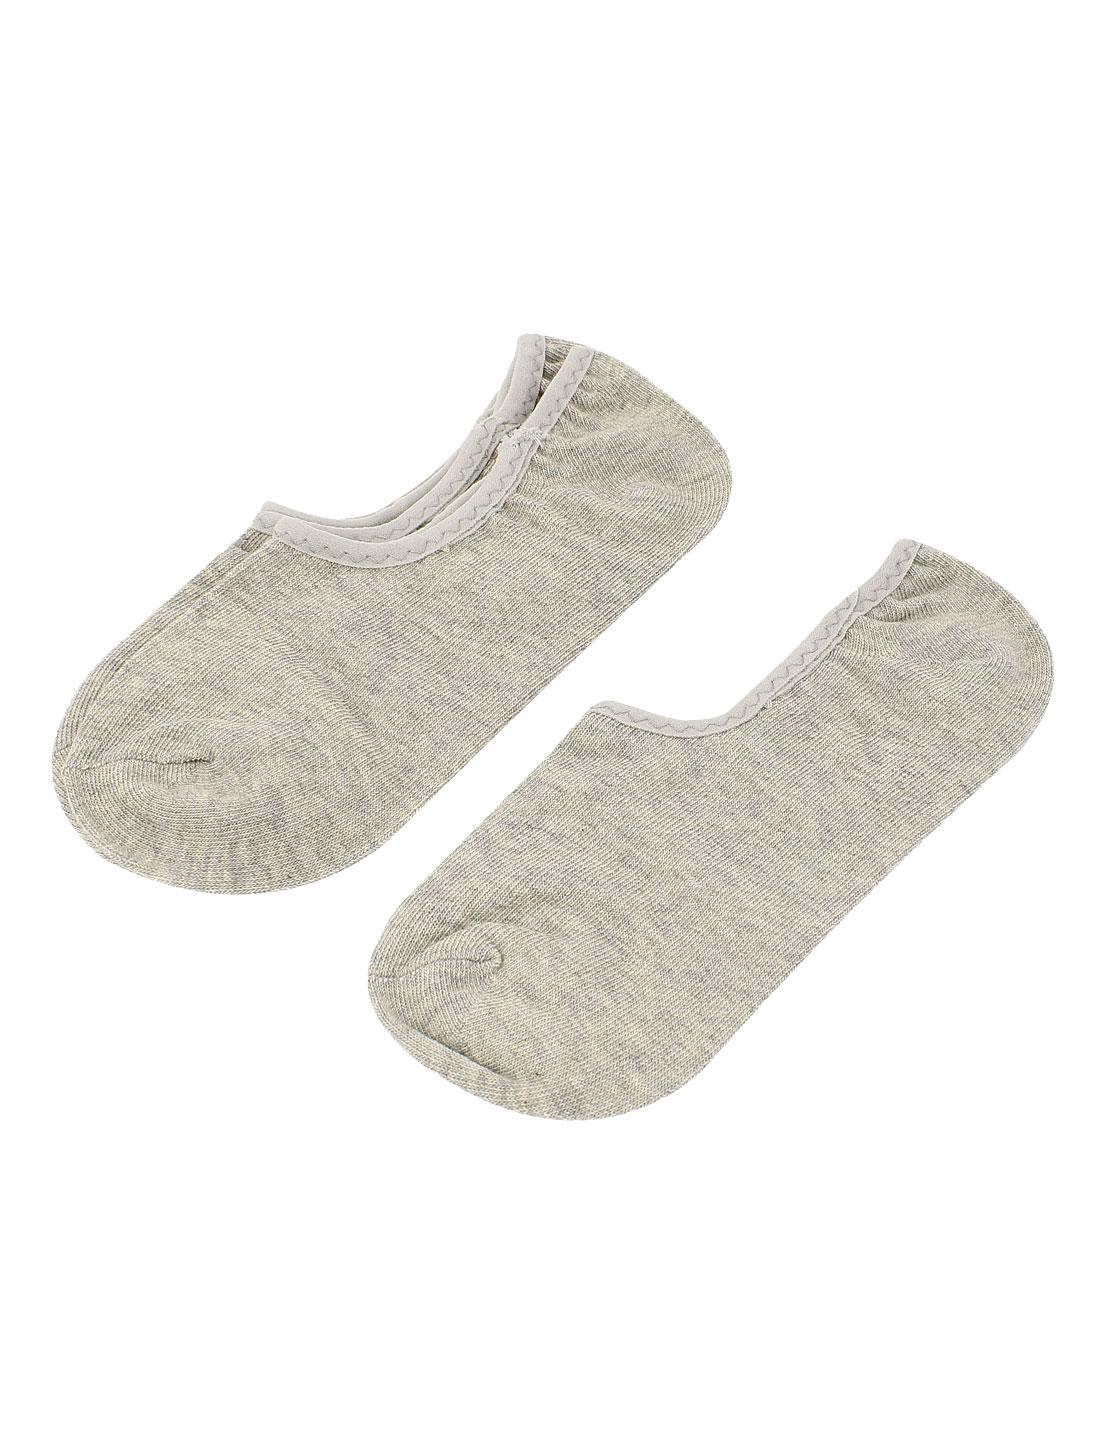 2 Pairs Sport Gray Elastic Invisible Low Cut Heels Boat Footie Socks Socken for Lady